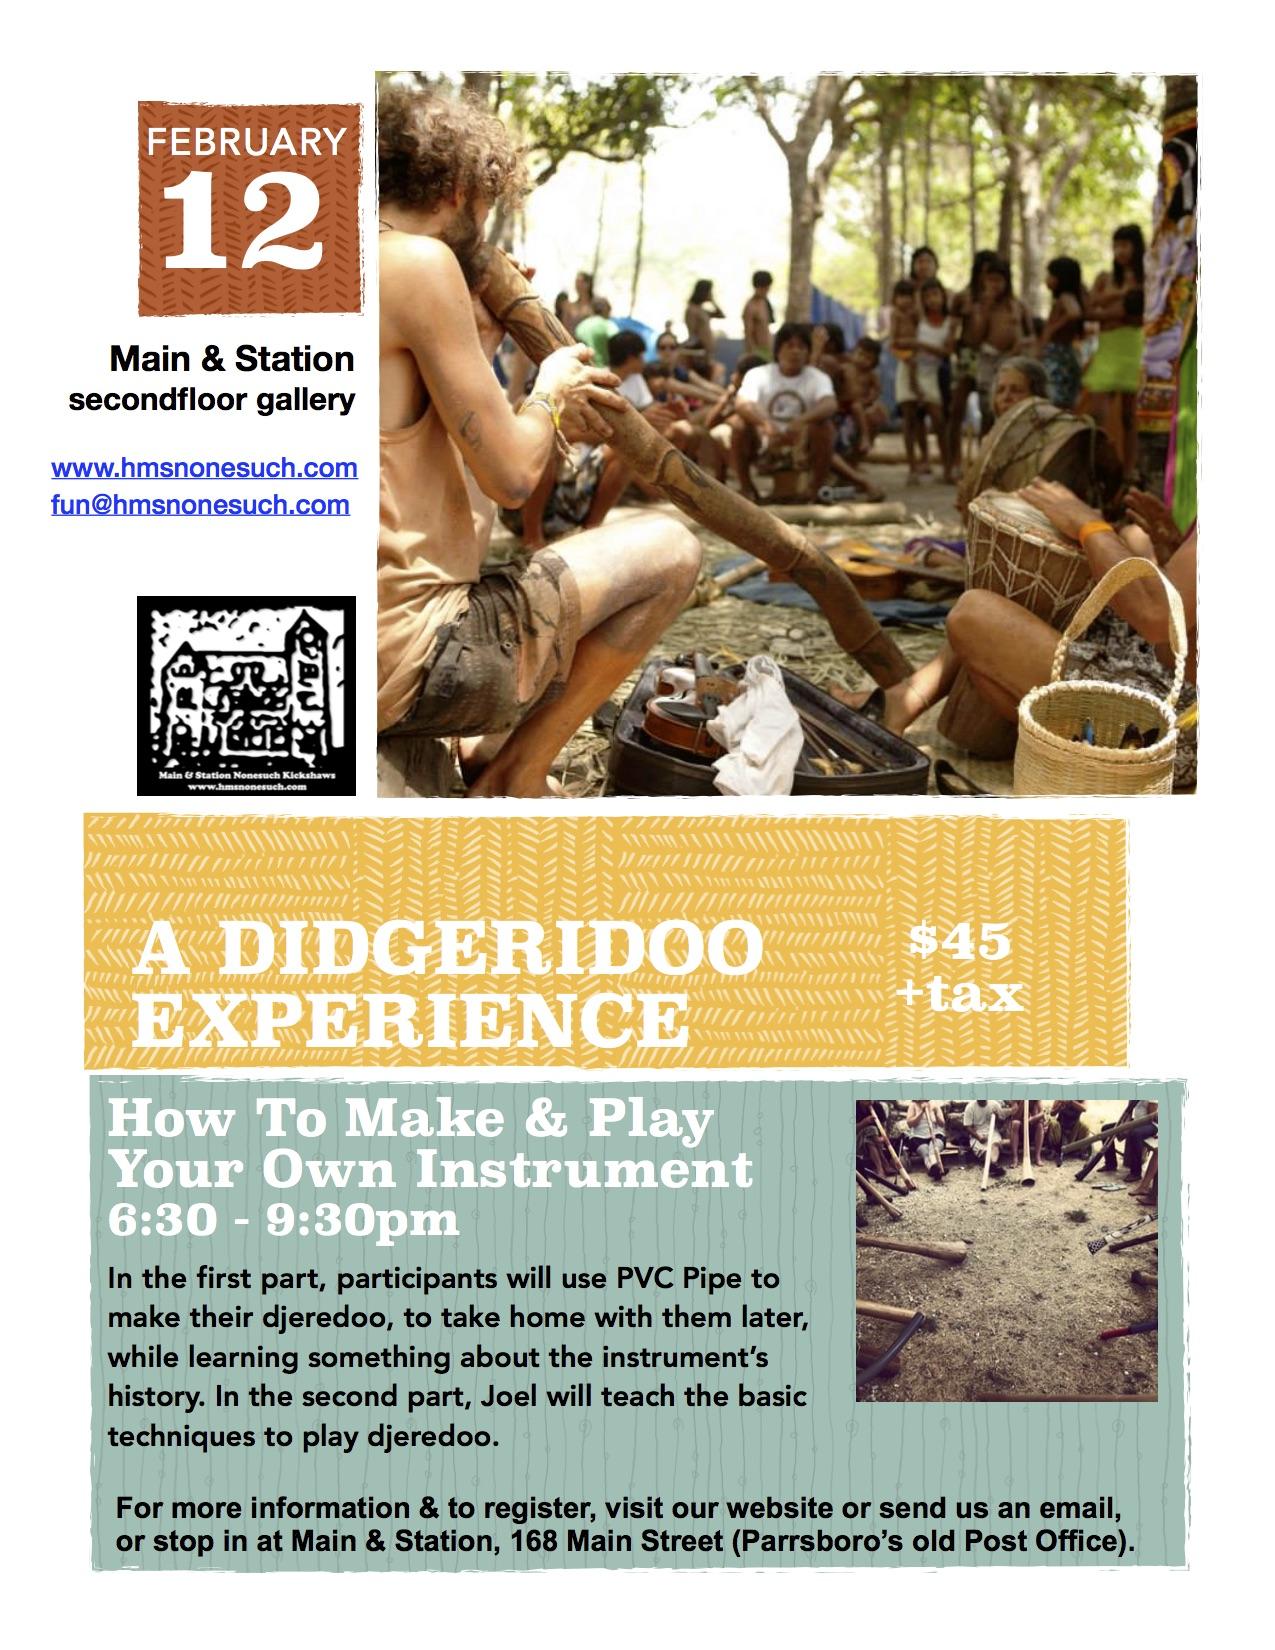 A Didgeridoo Experience